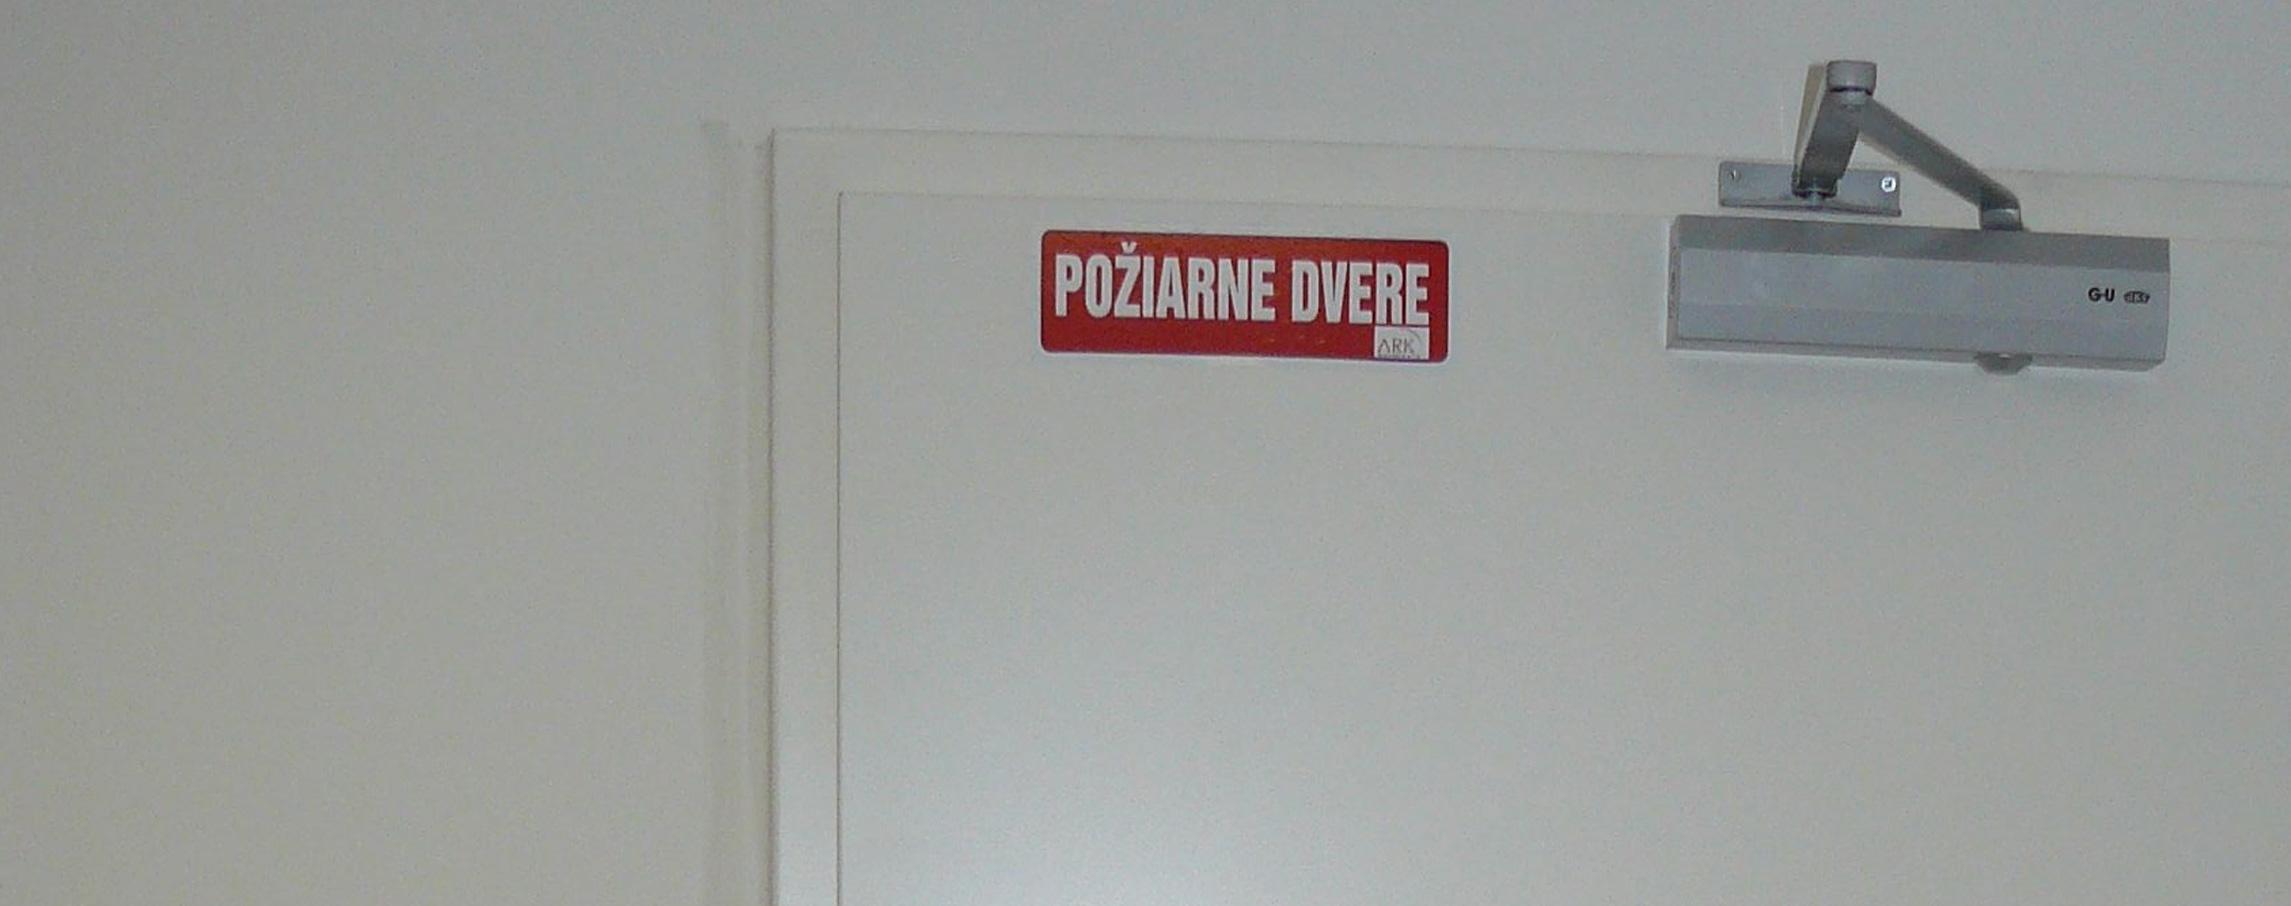 Požiarne dvere ARK Slovaka banner 3, v2